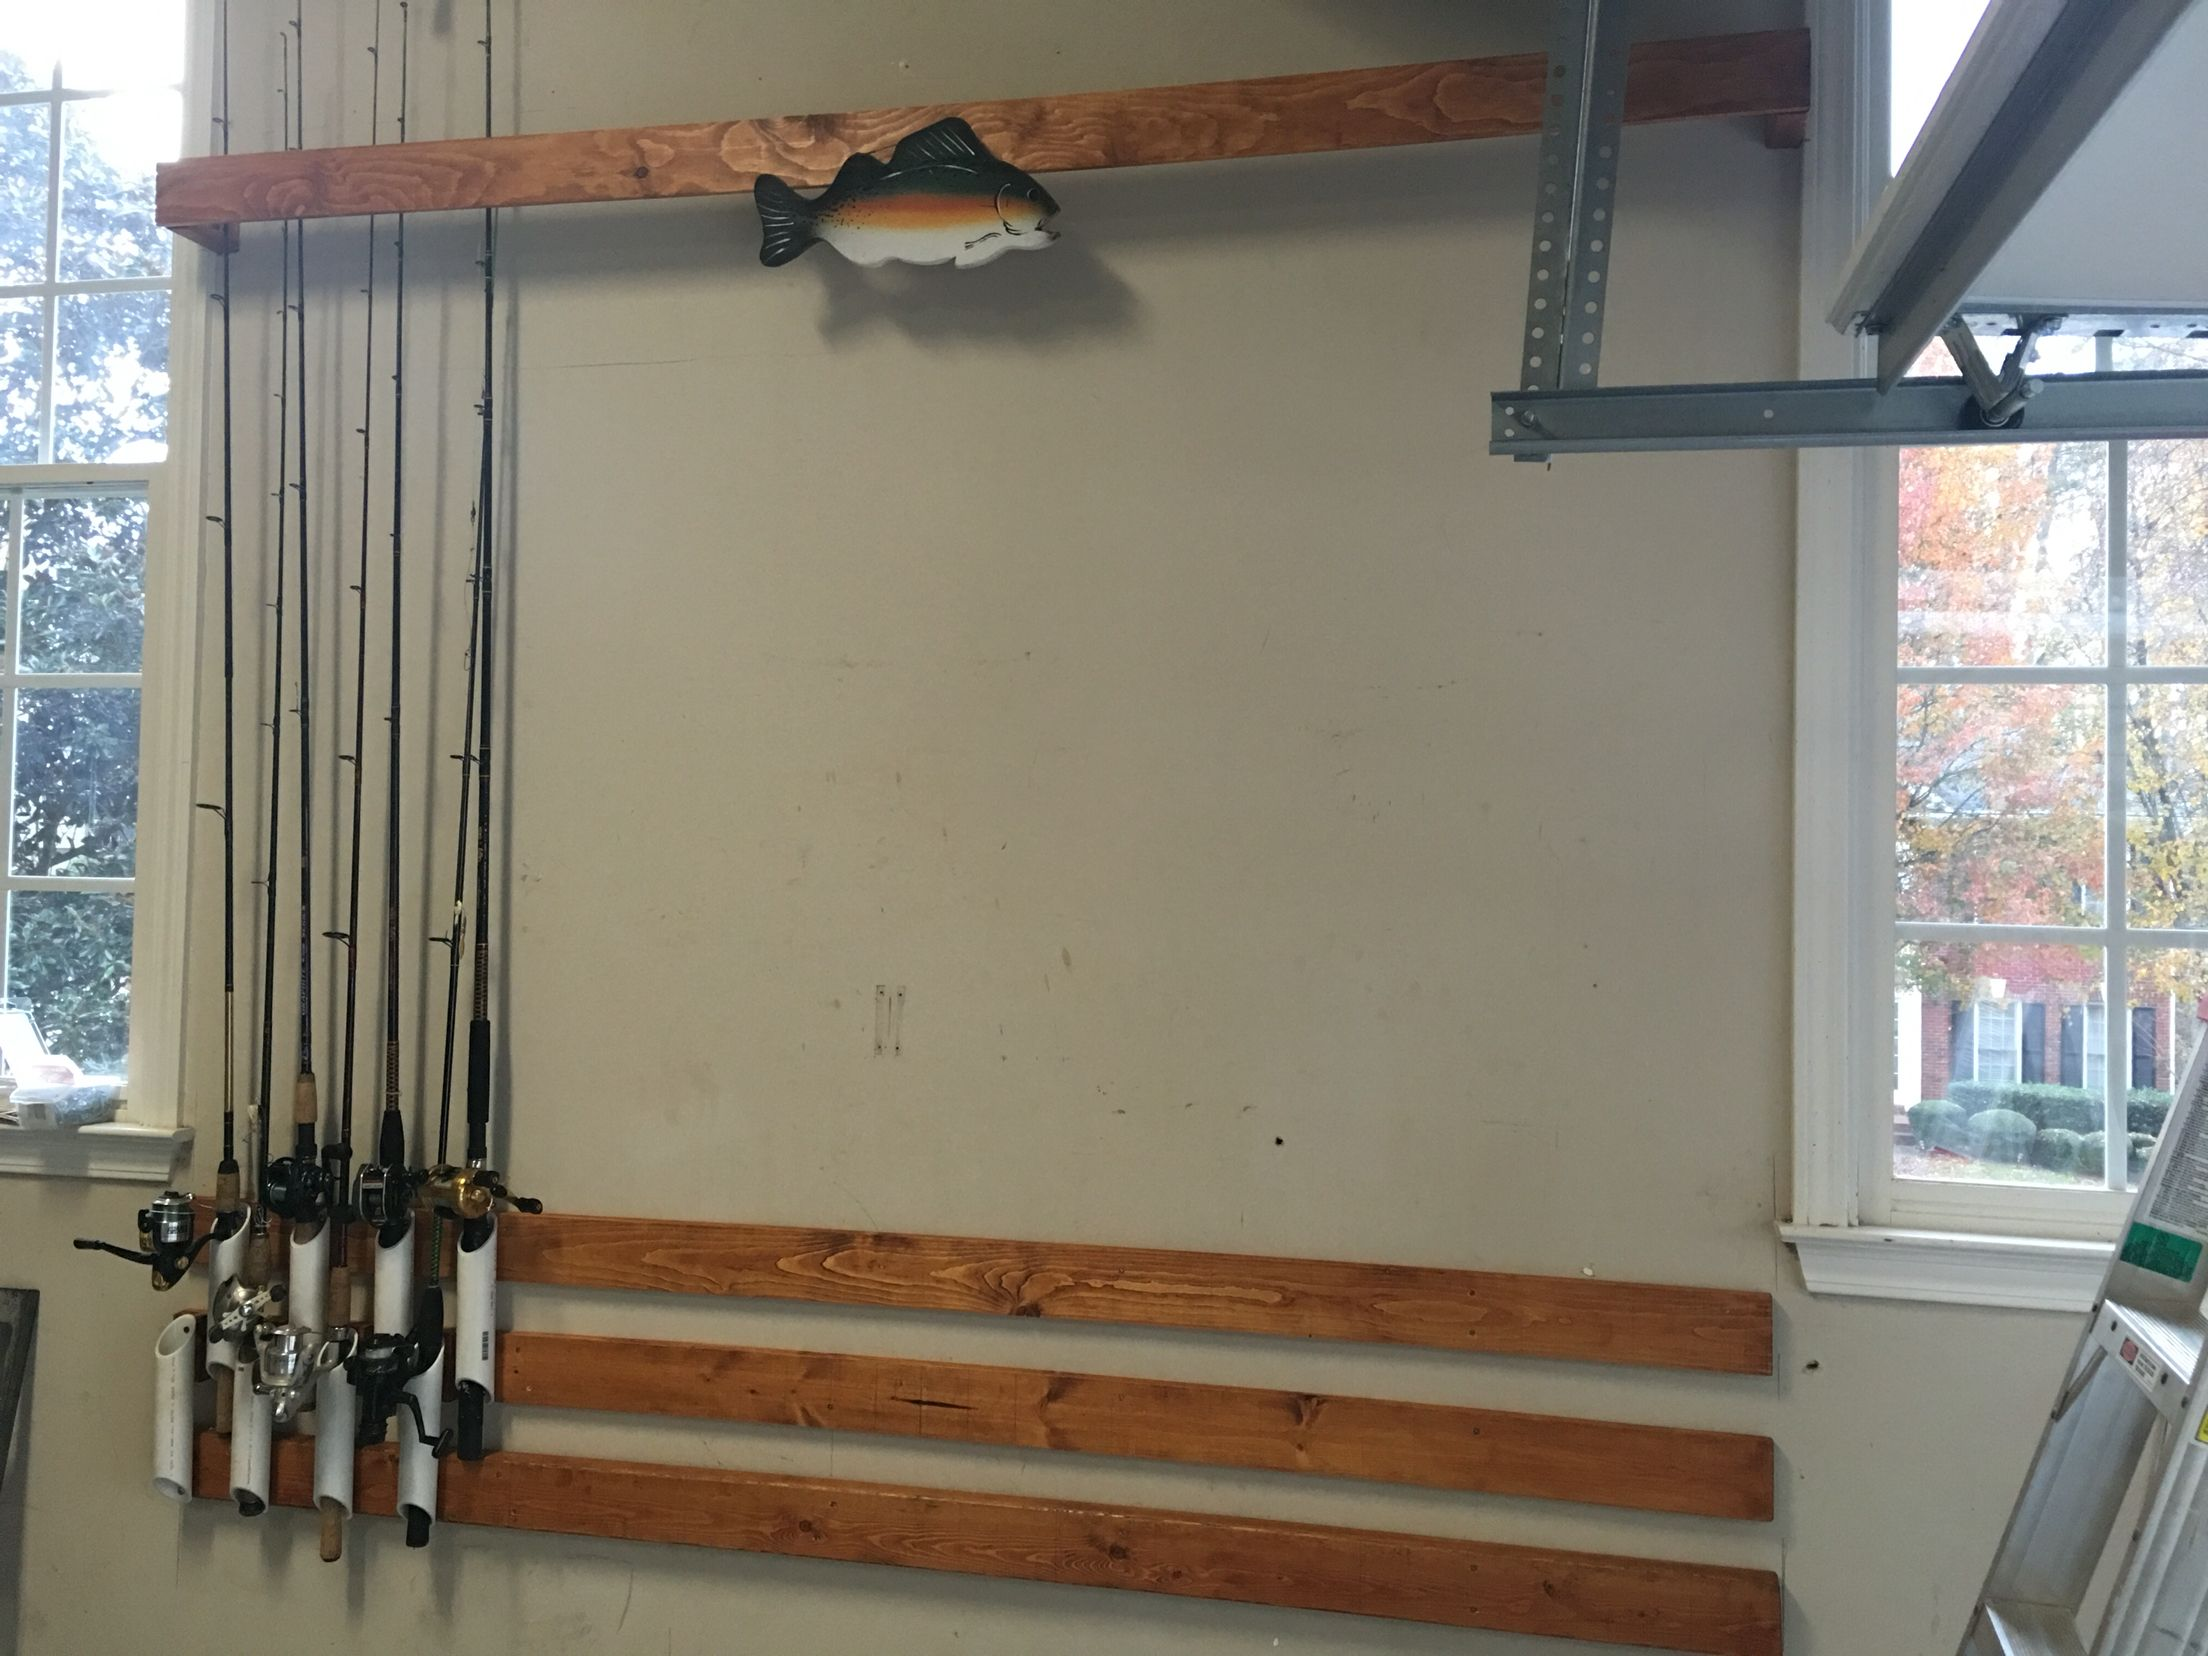 Great Fishing Pole Storage!